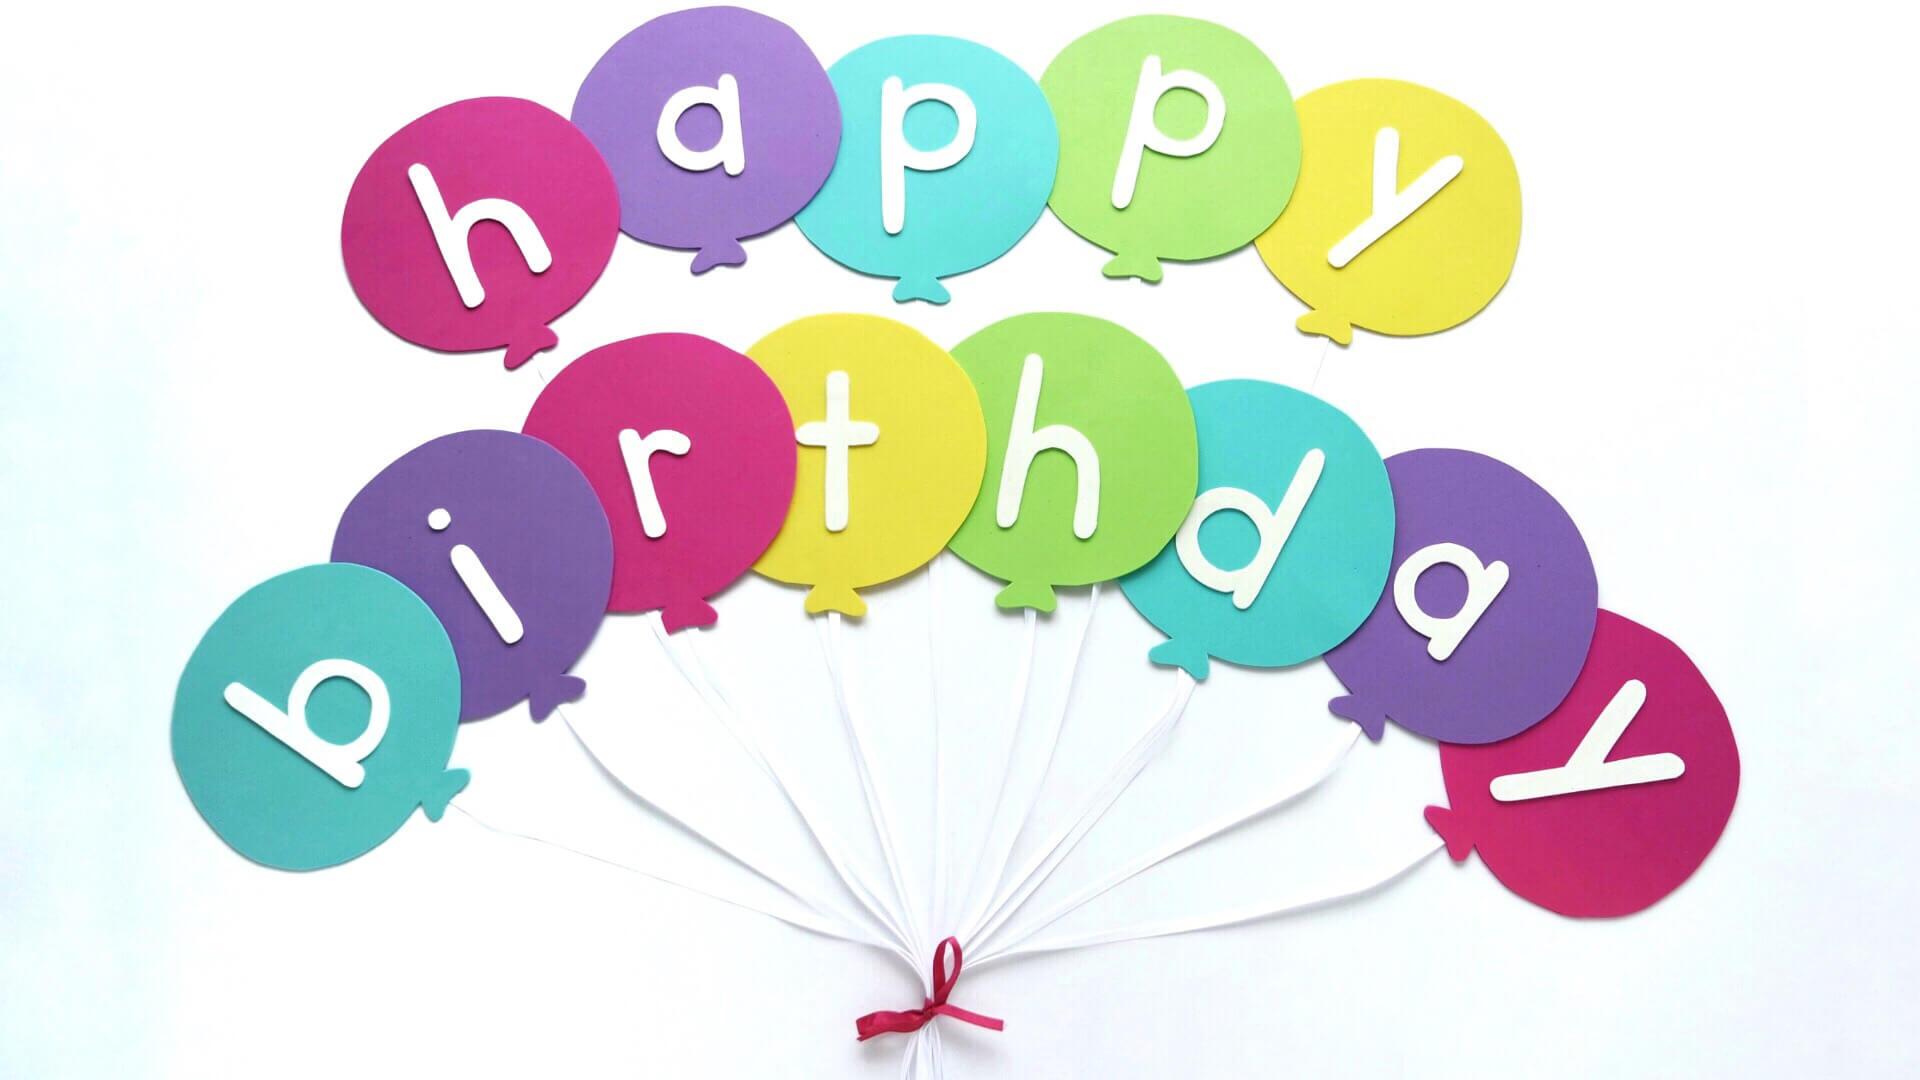 Happy Birthday Banner Diy Template   Balloon Birthday Banner In Diy Birthday Banner Template